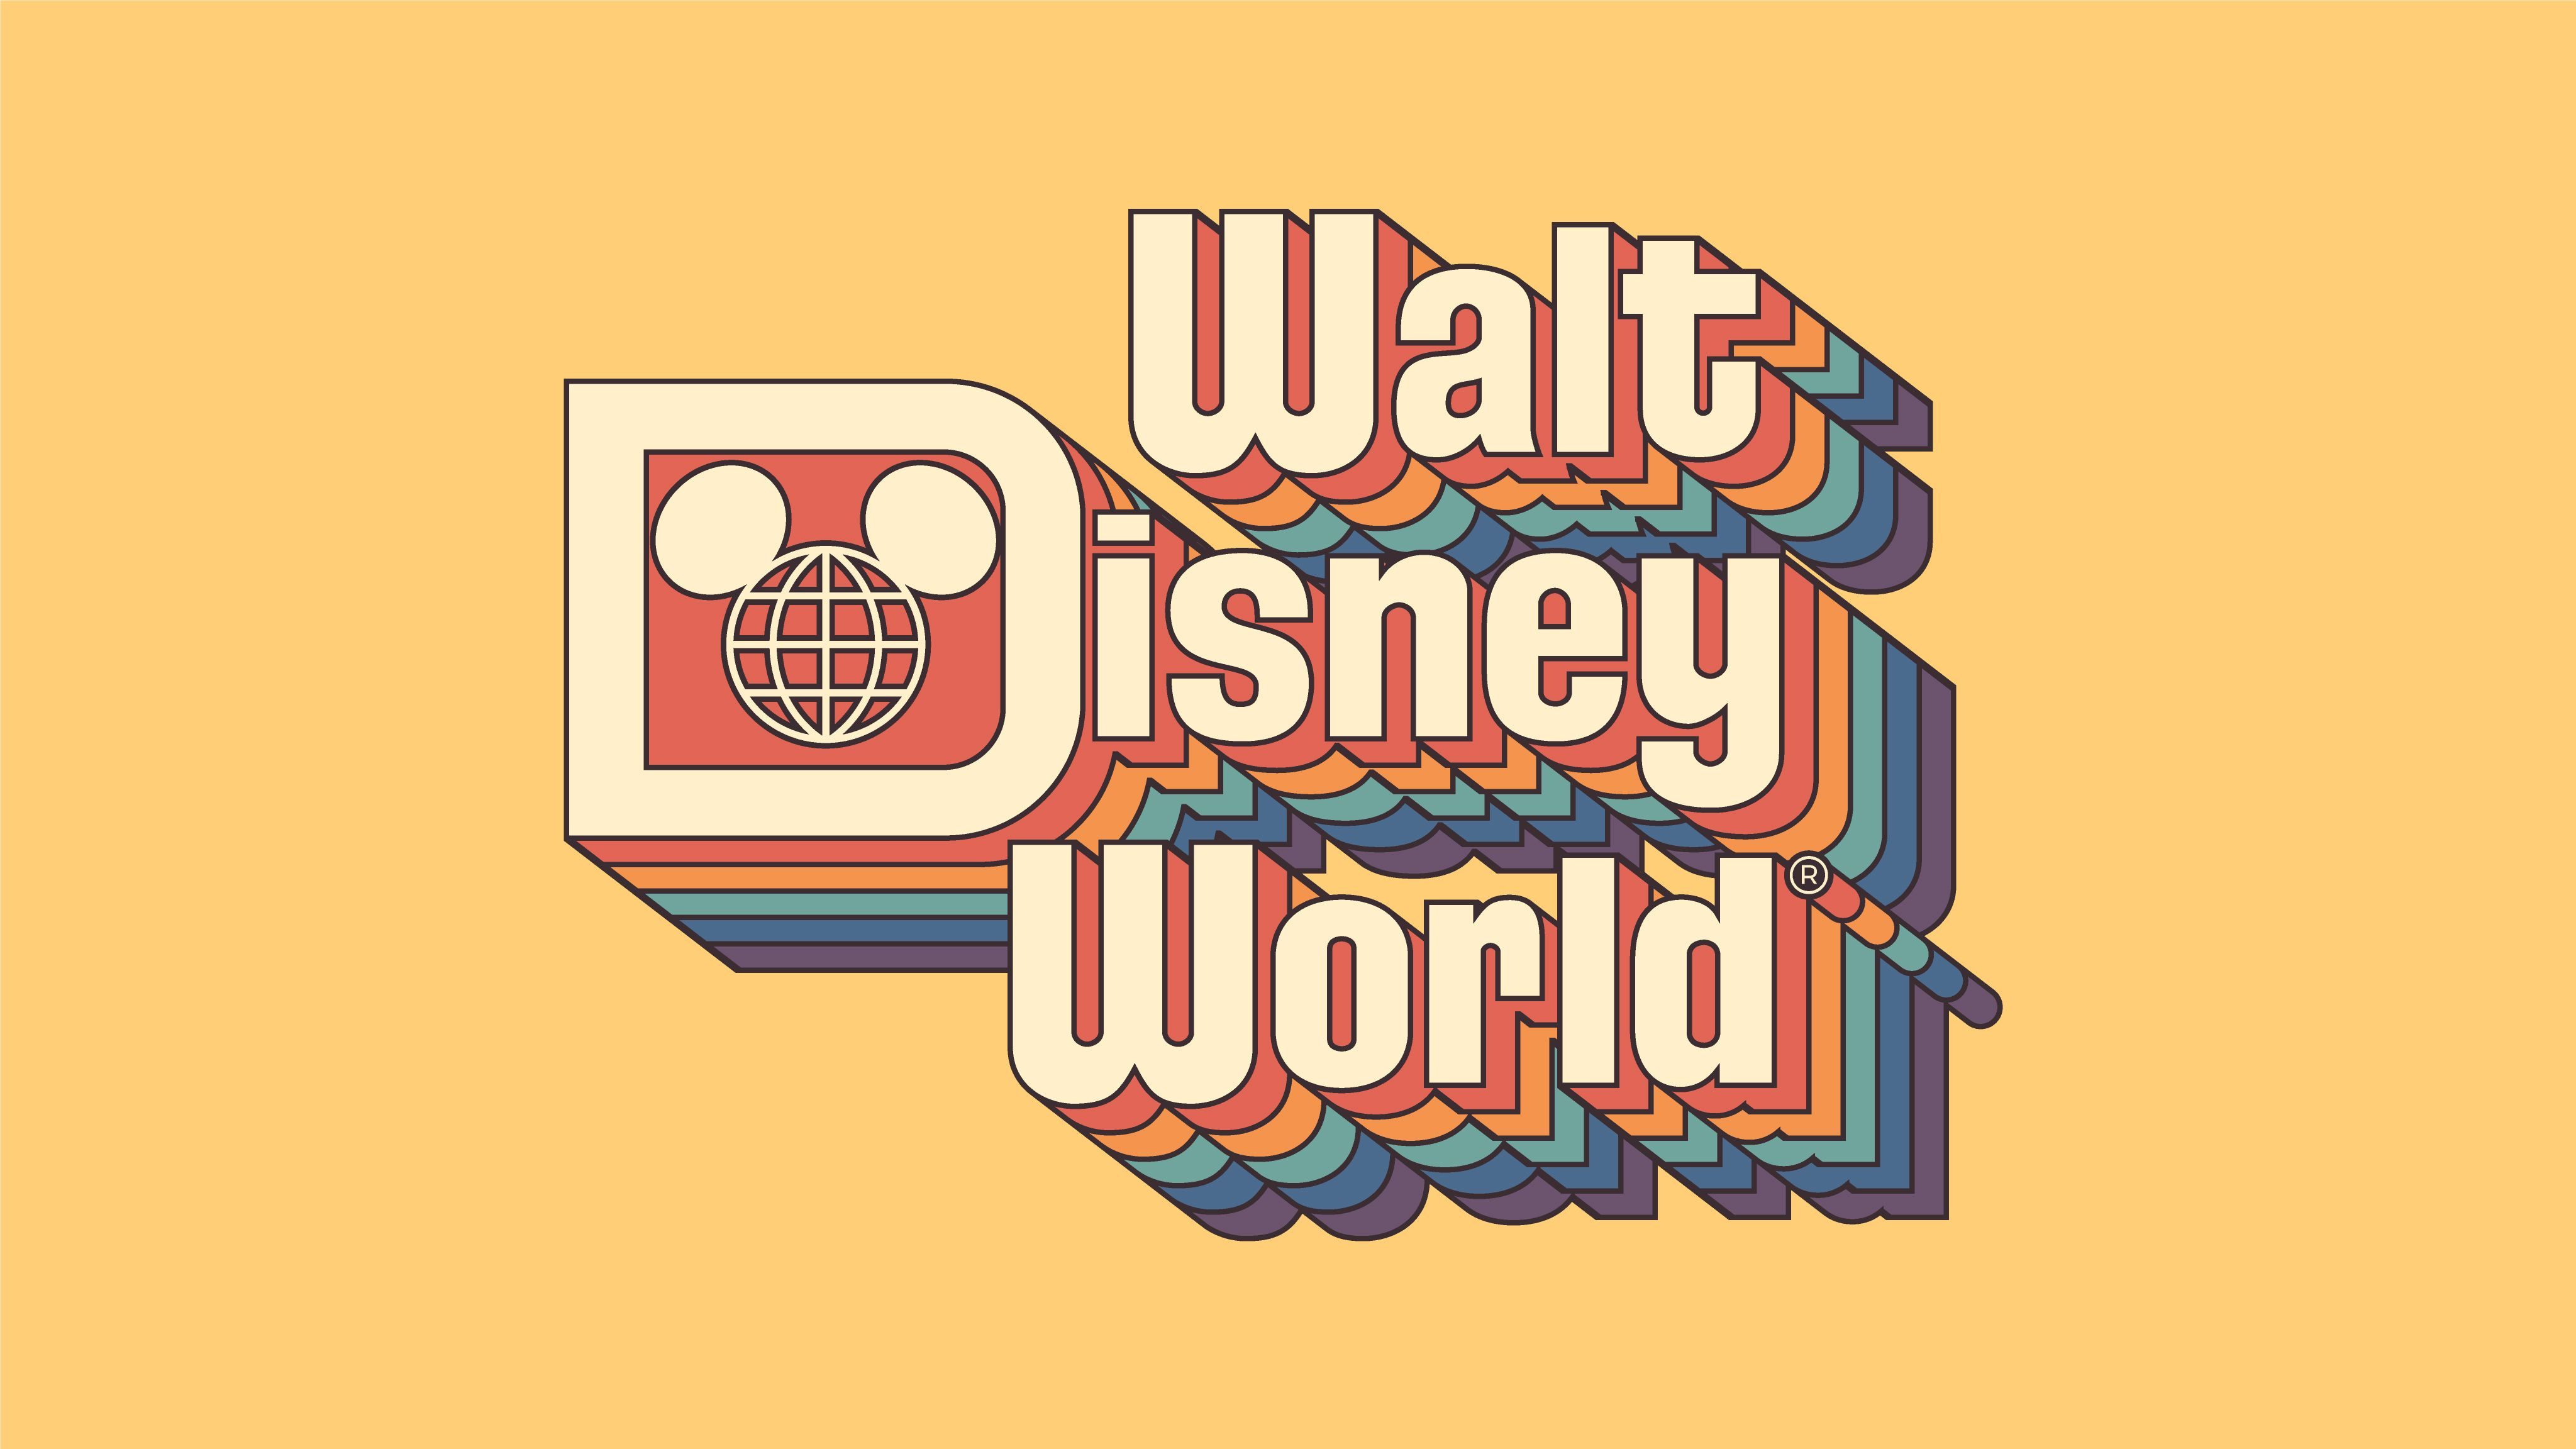 Vintage Disney Computer Wallpapers Top Free Vintage Disney Computer Backgrounds Wallpaperaccess